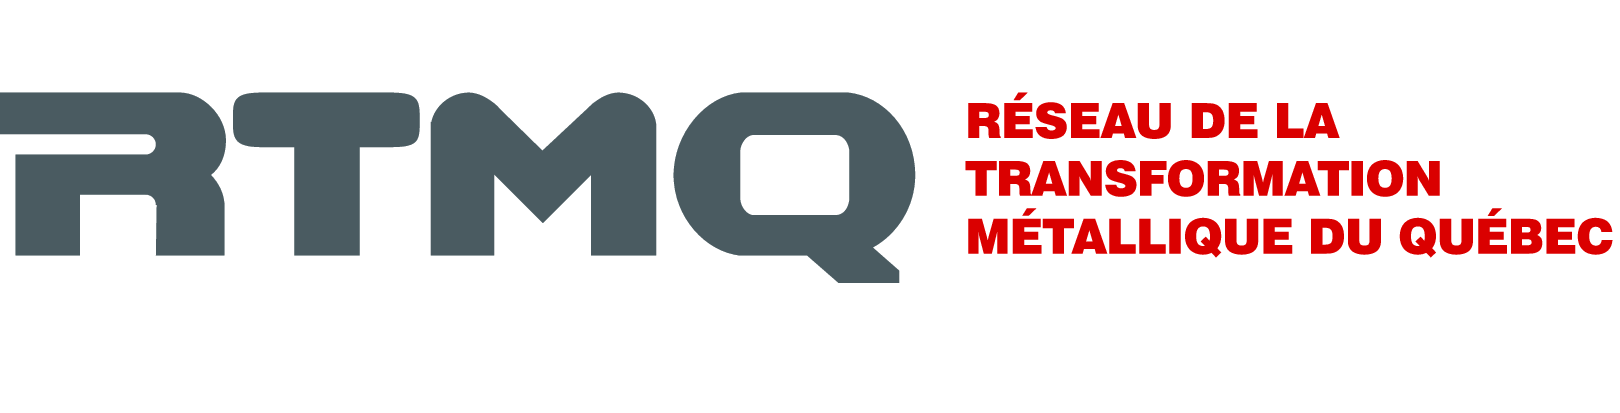 Logo Réseau de la transformation métallique du Québec